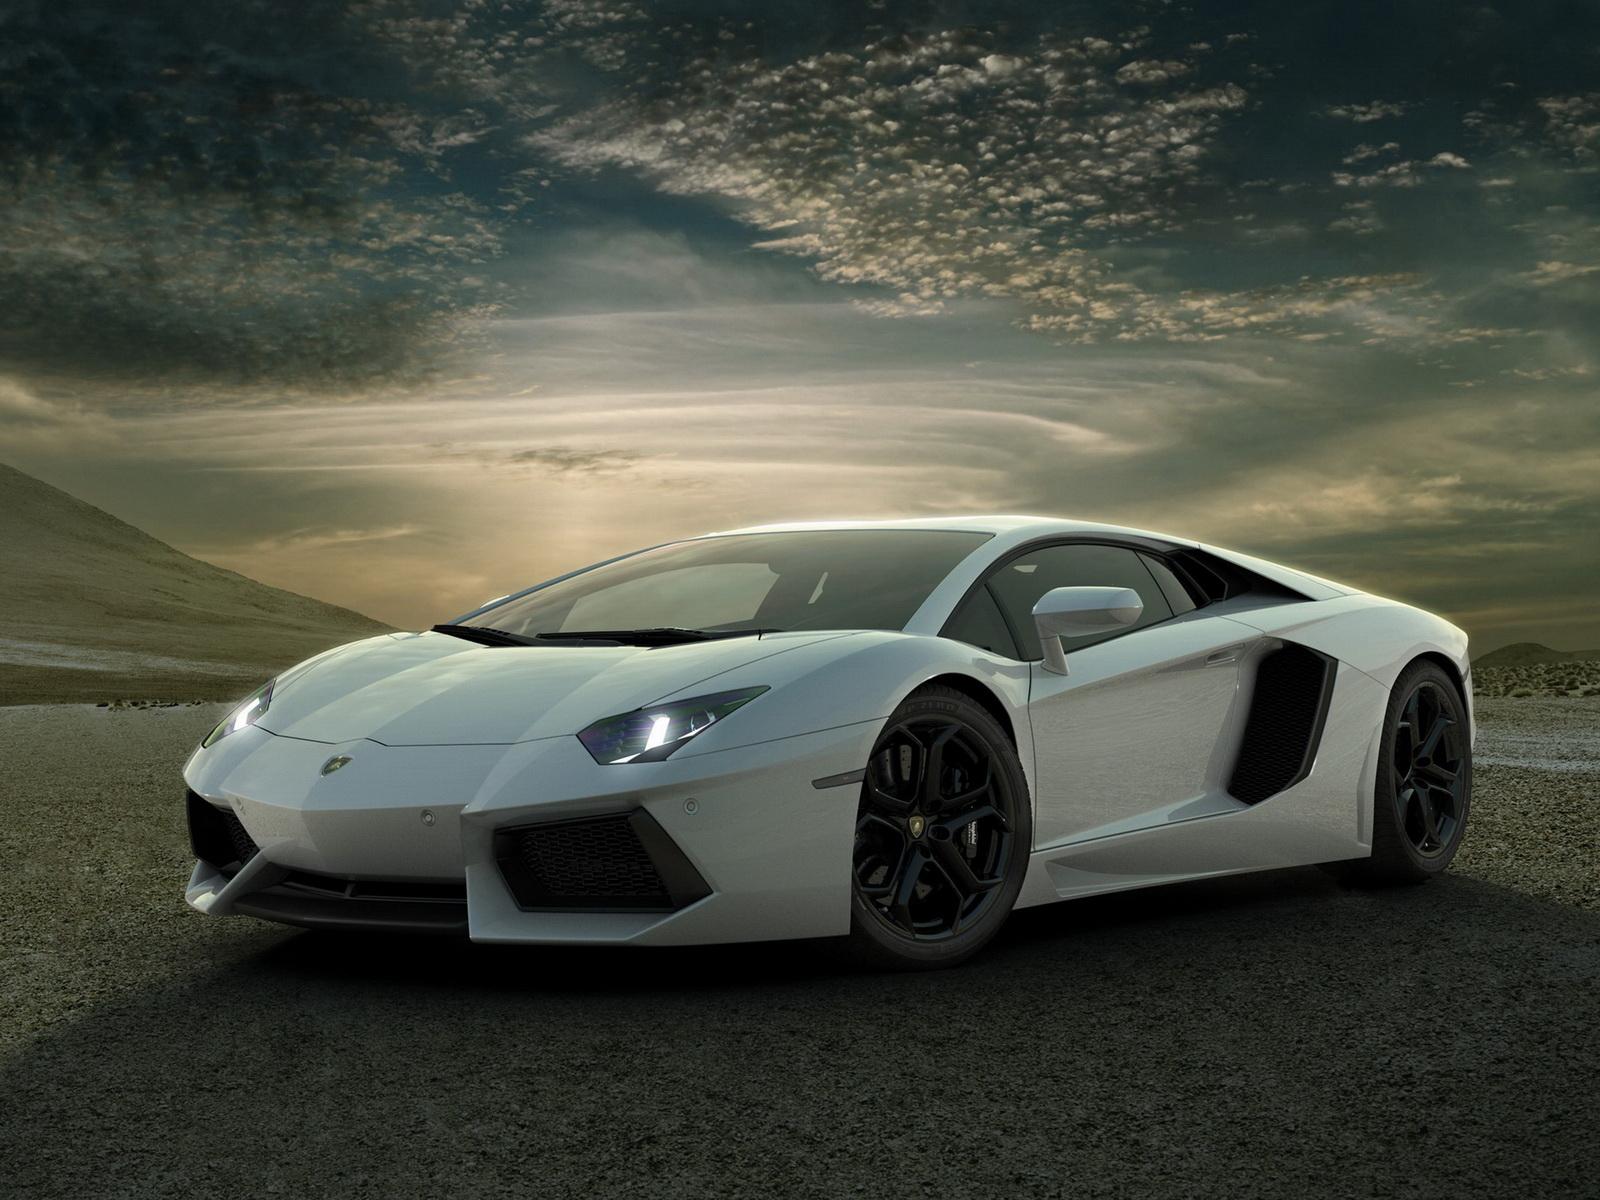 Auto Lamborghini Lamborghini Aventador 030063 jpg 1600x1200